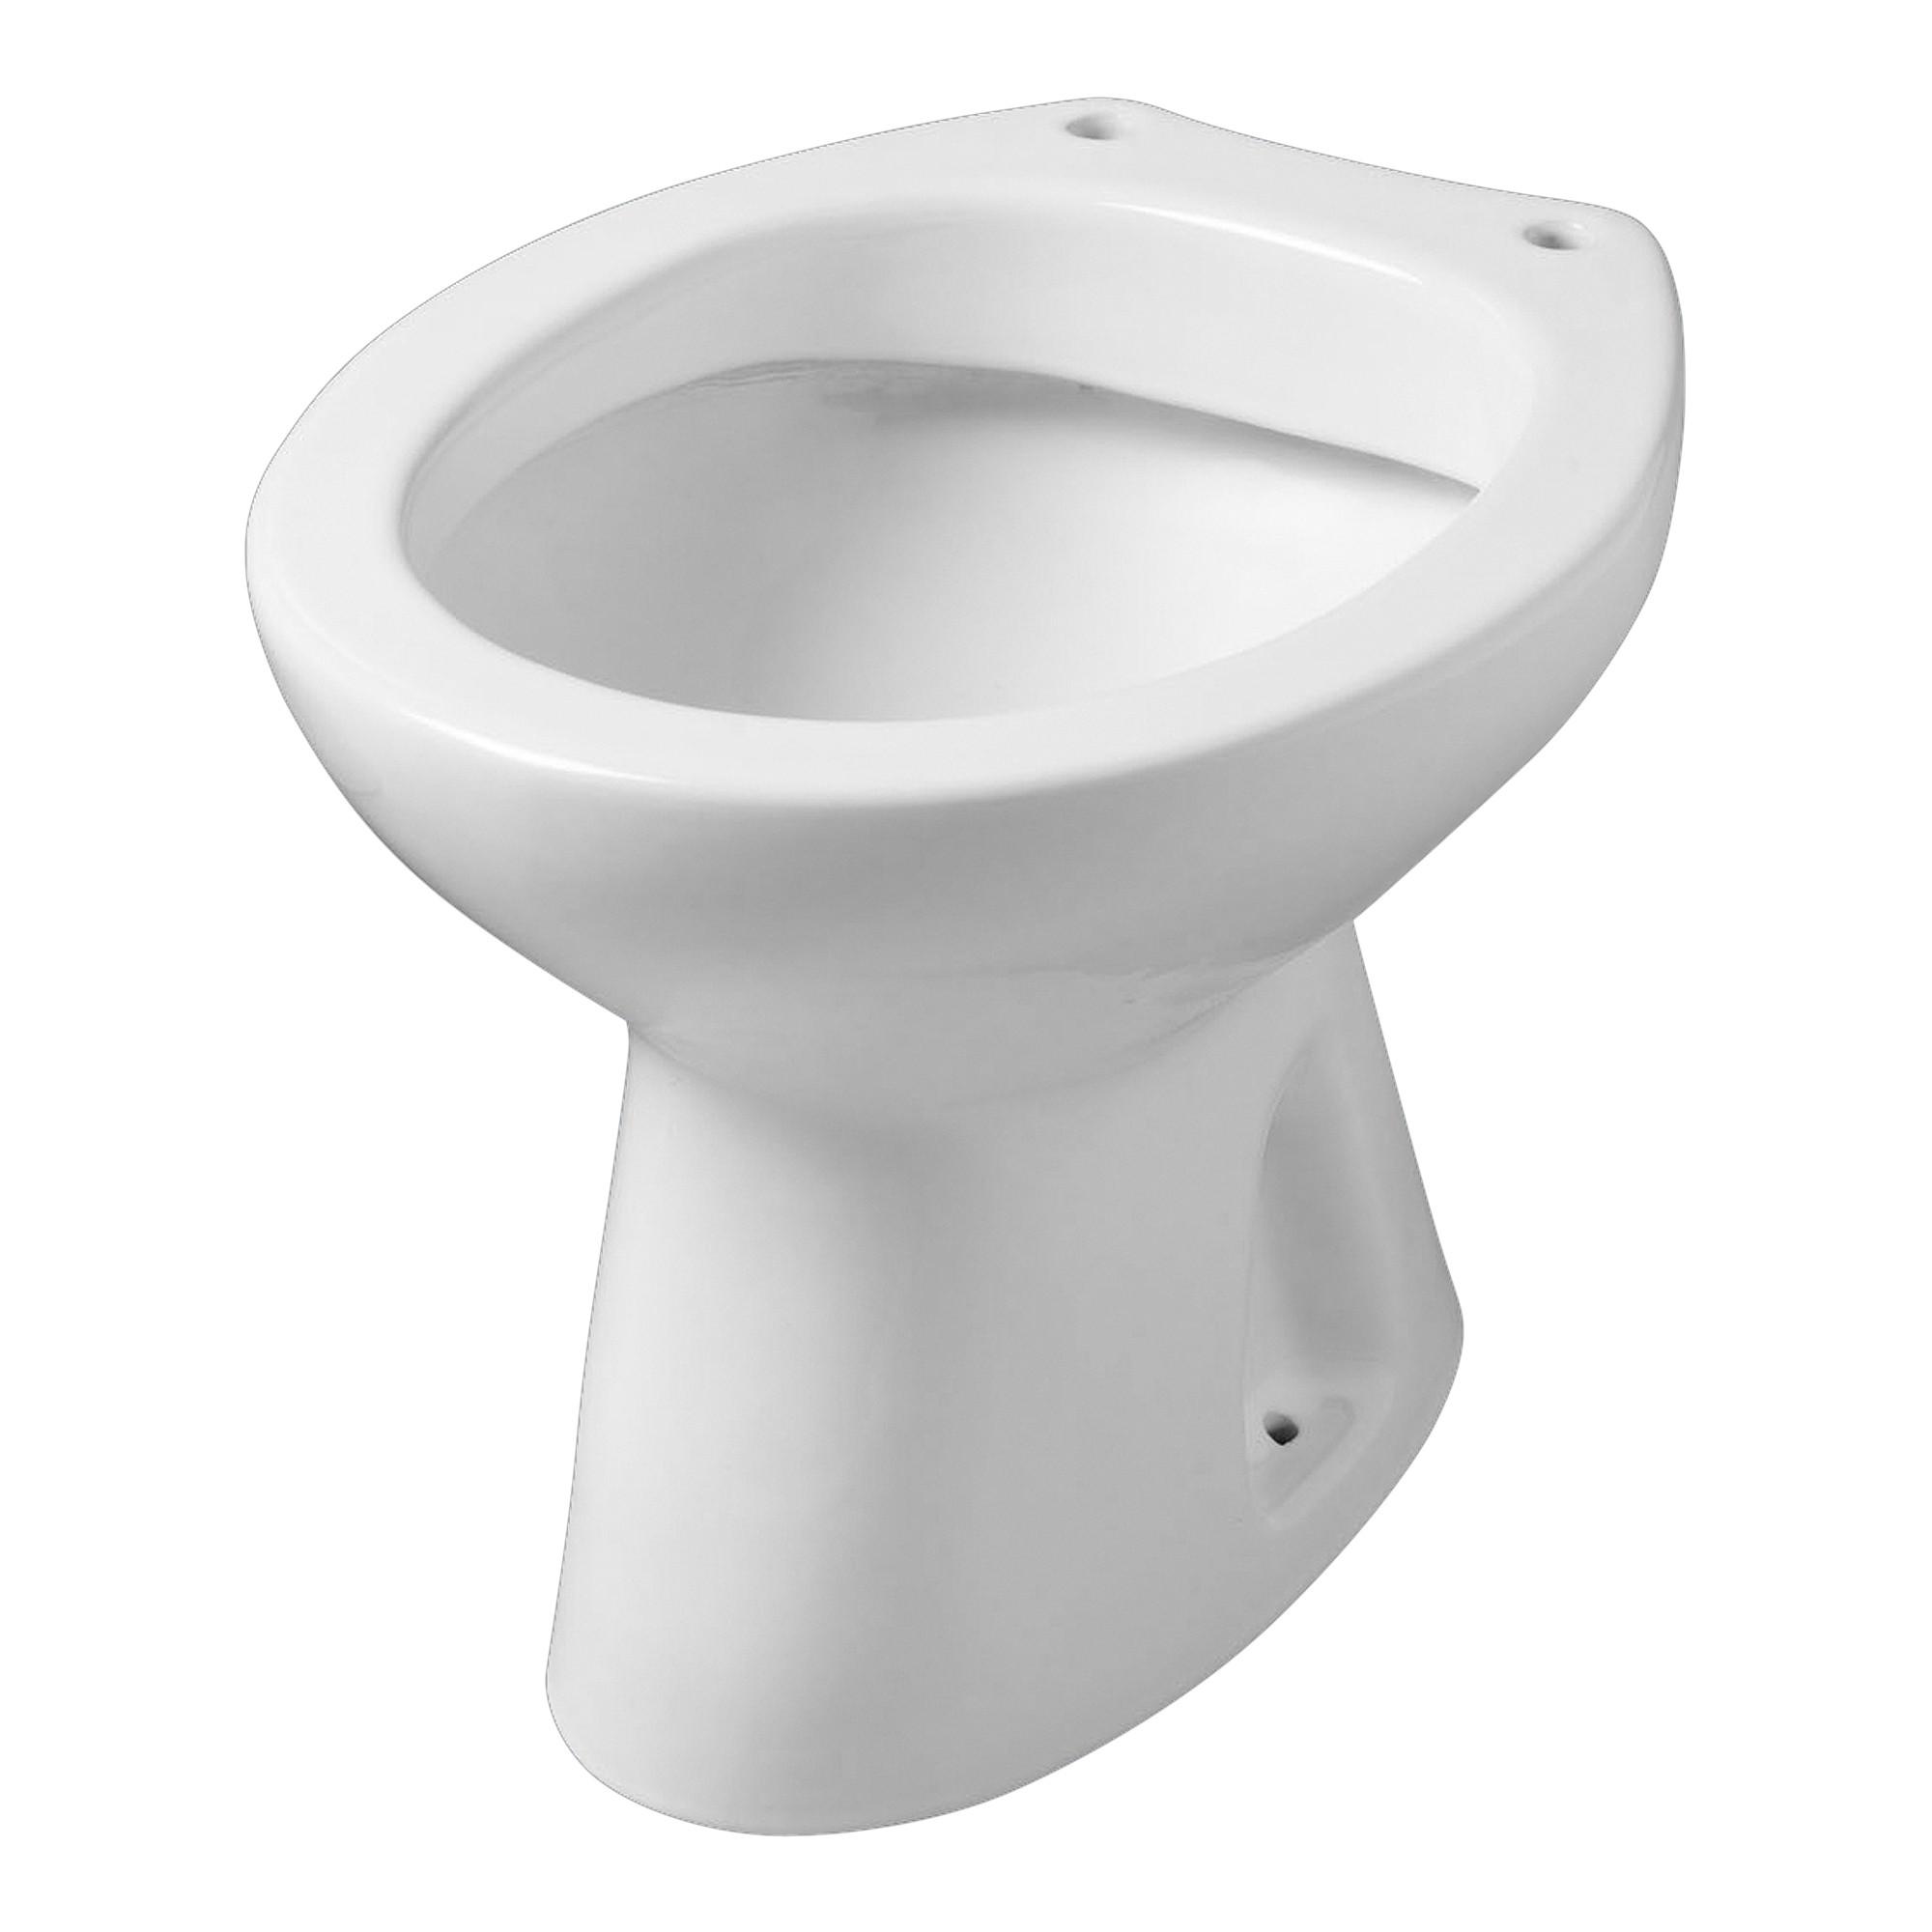 Enlever bidet salle de bain - Comment retirer un bidet ...